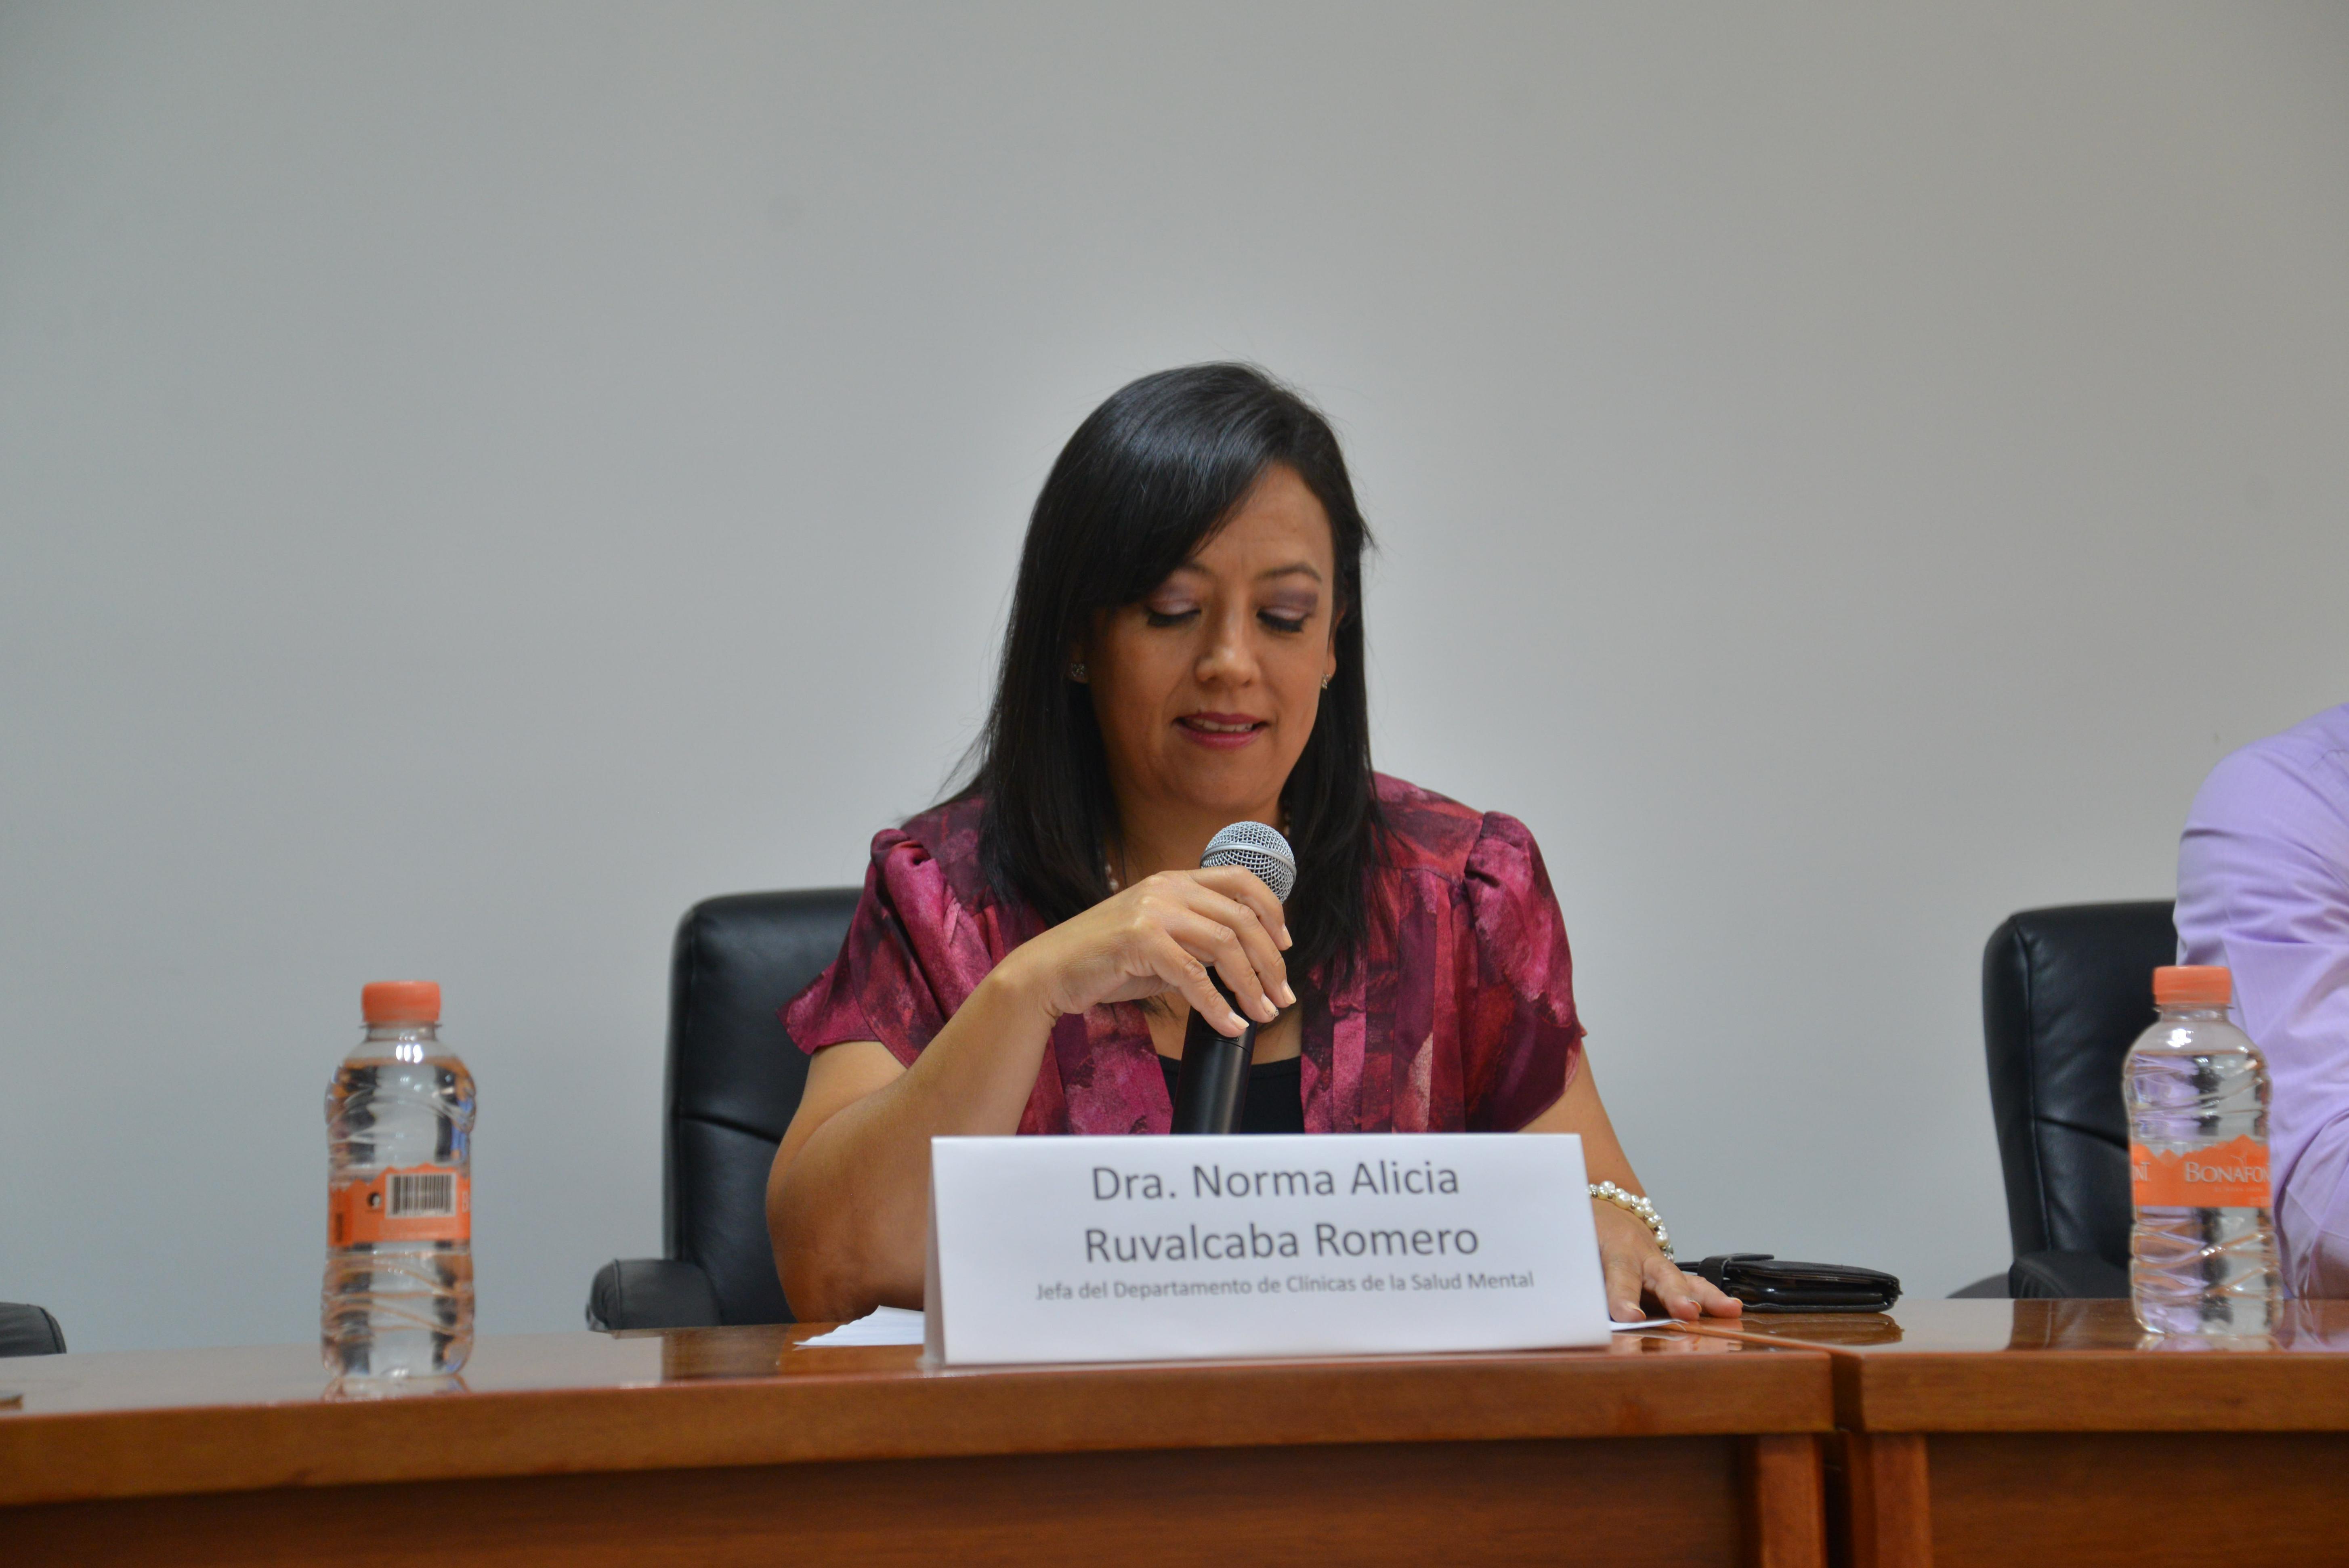 Dra. Norma Alicia Ruvalcaba, dando discurso en acto inaugural